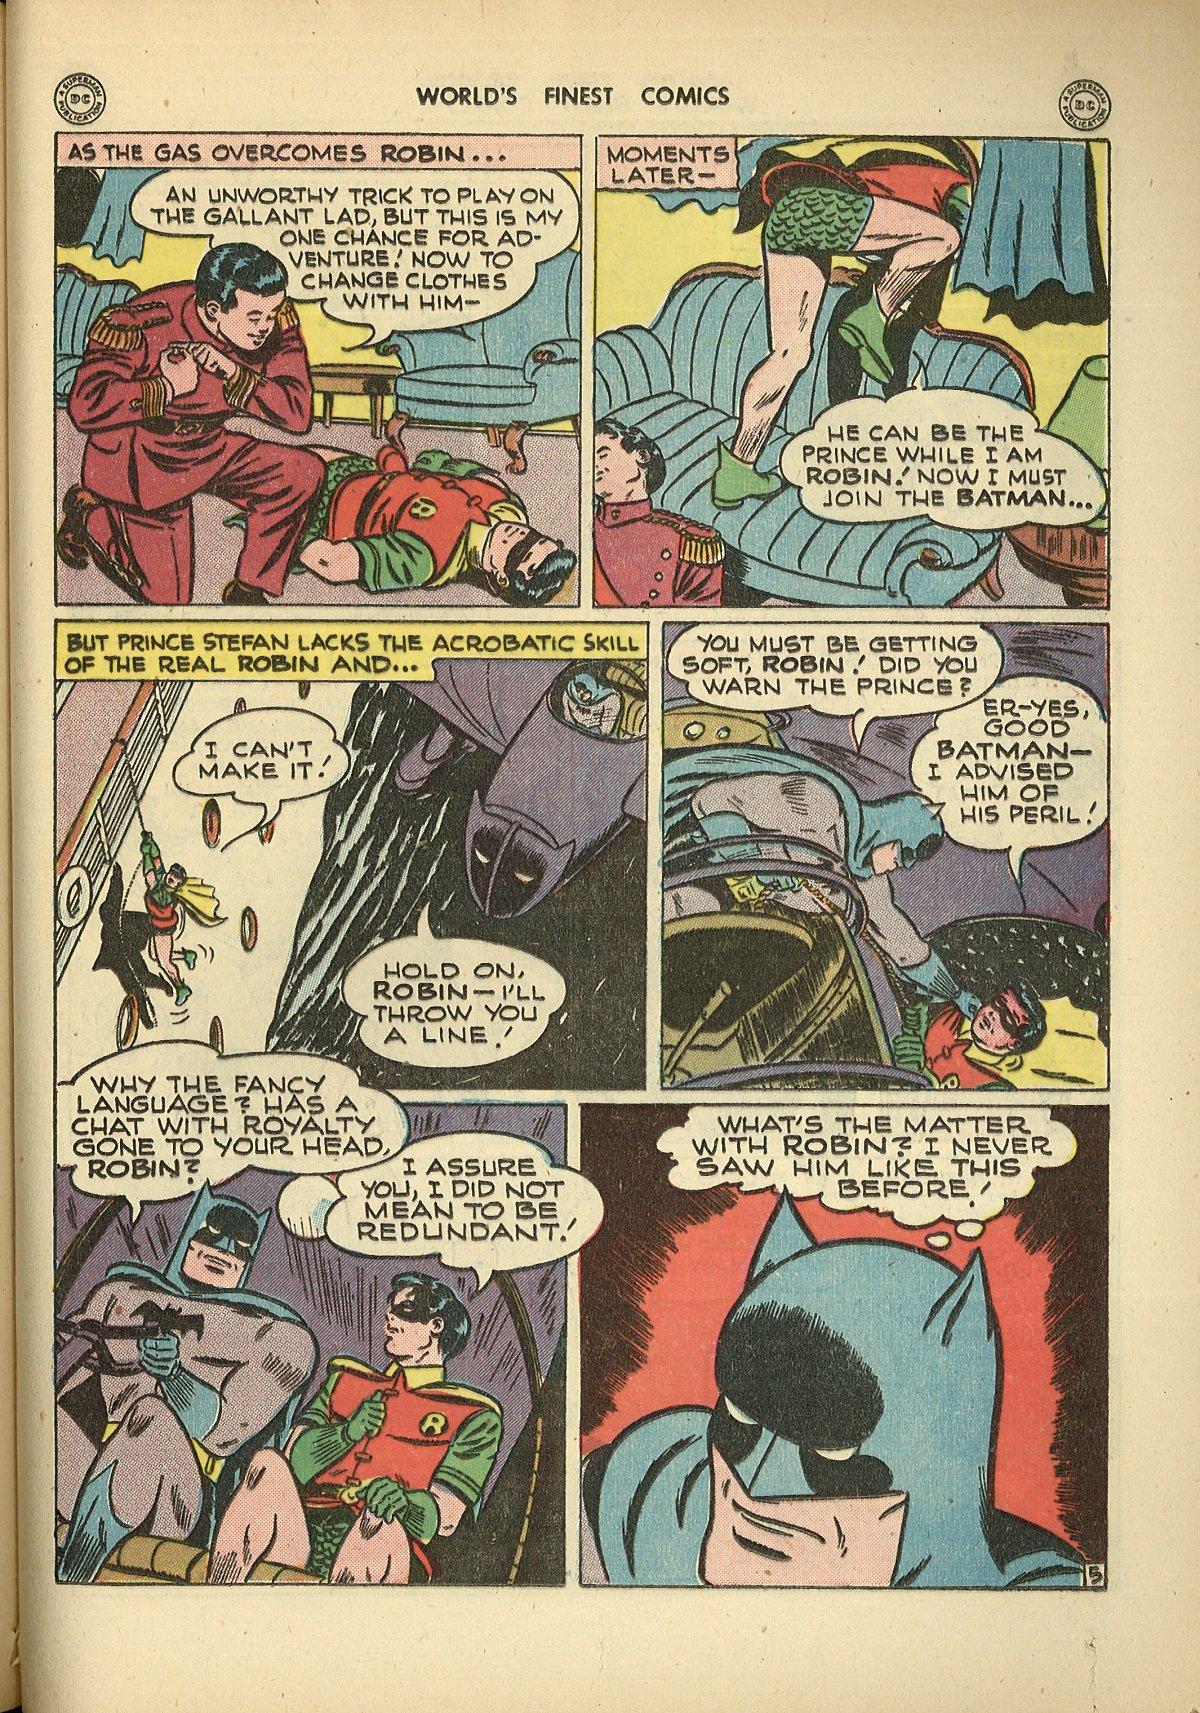 Read online World's Finest Comics comic -  Issue #26 - 65